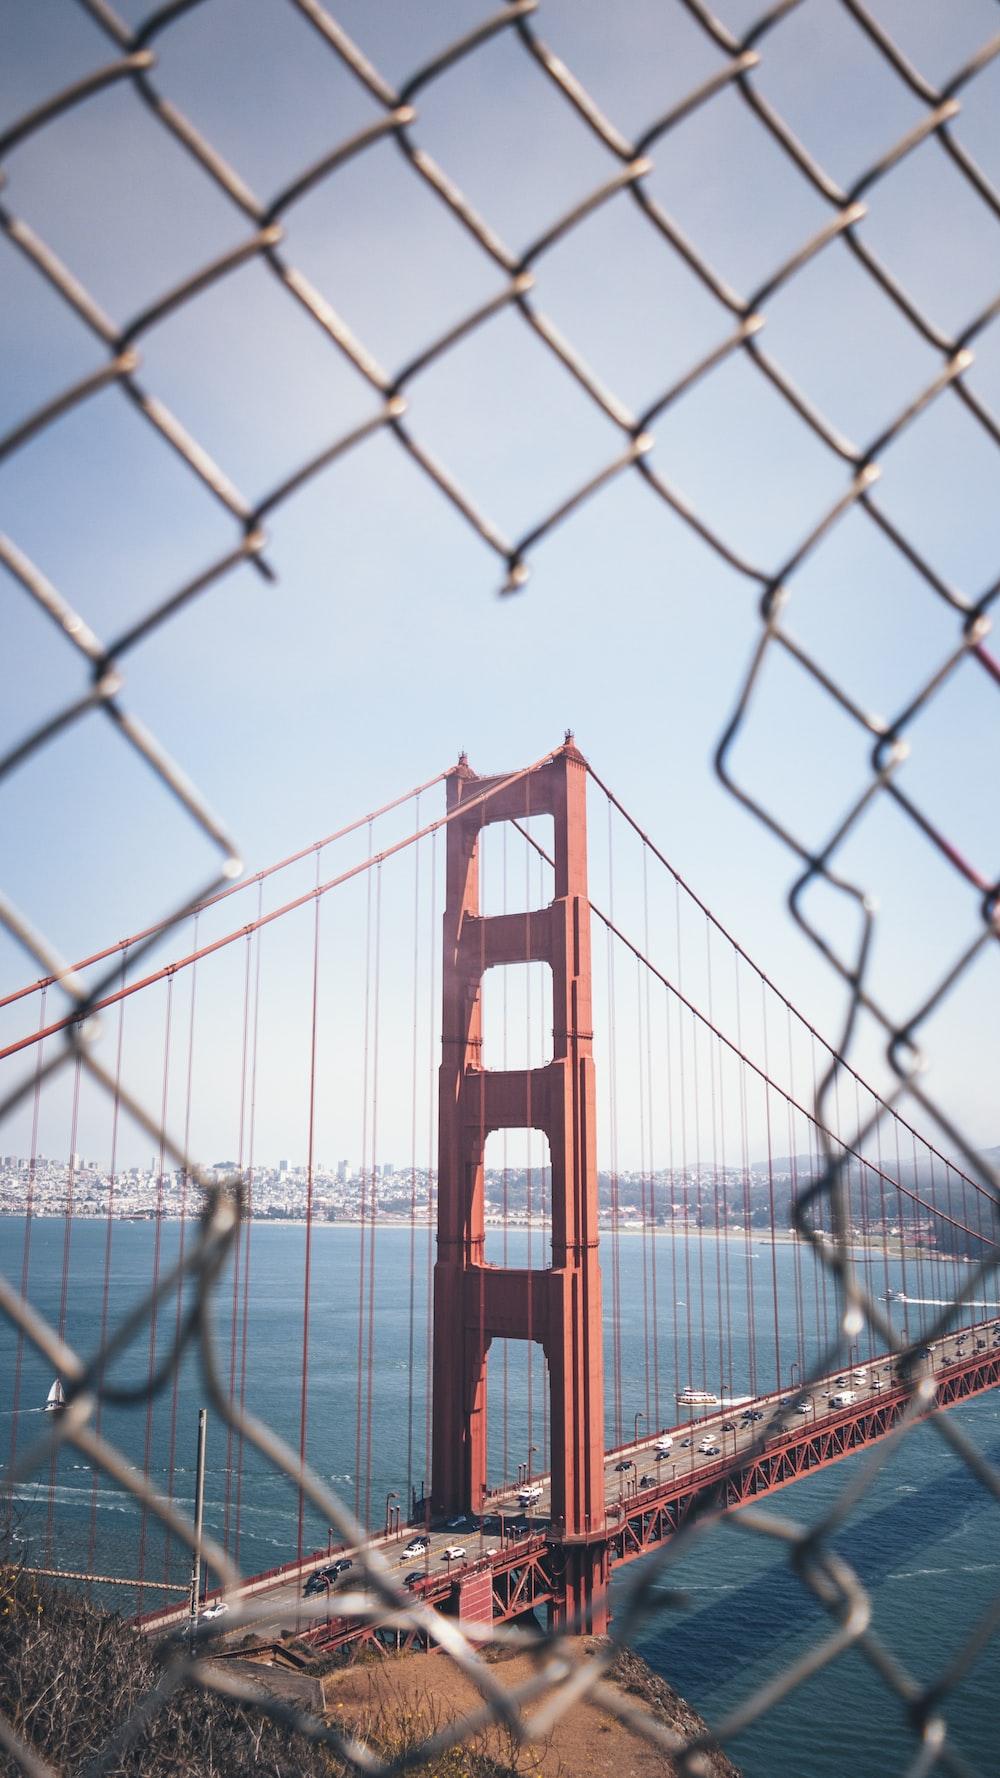 architectural photography of Golden Gate Bridge